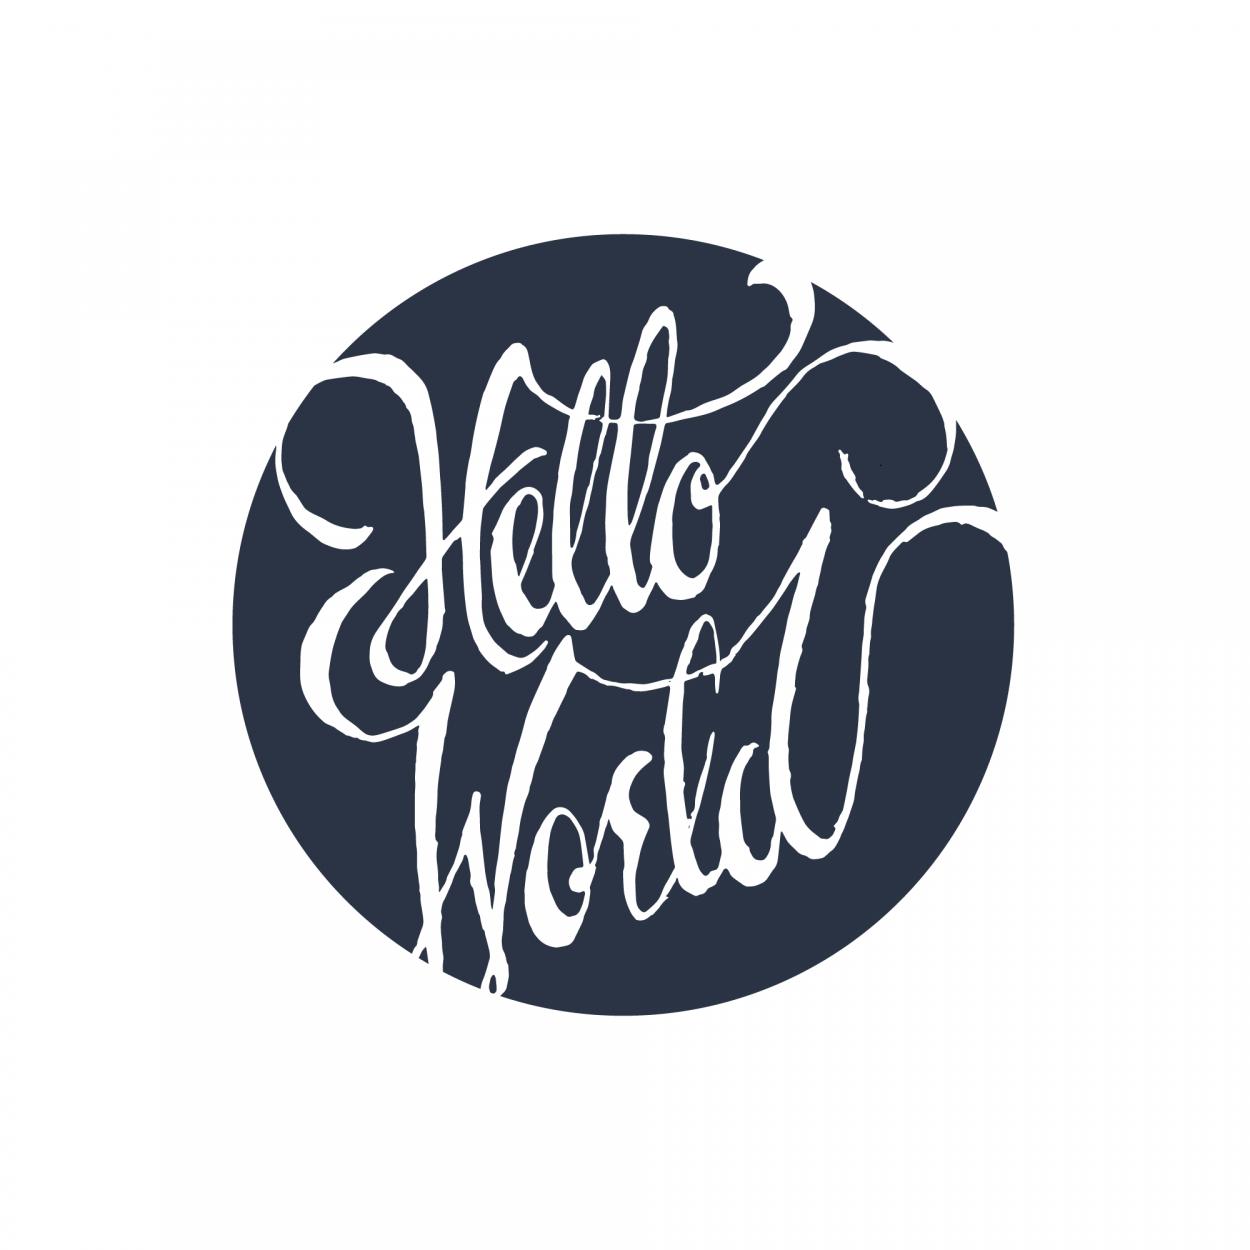 Hello World, We're Back! The Dalmore 25 Year Old Single Malt Scotch